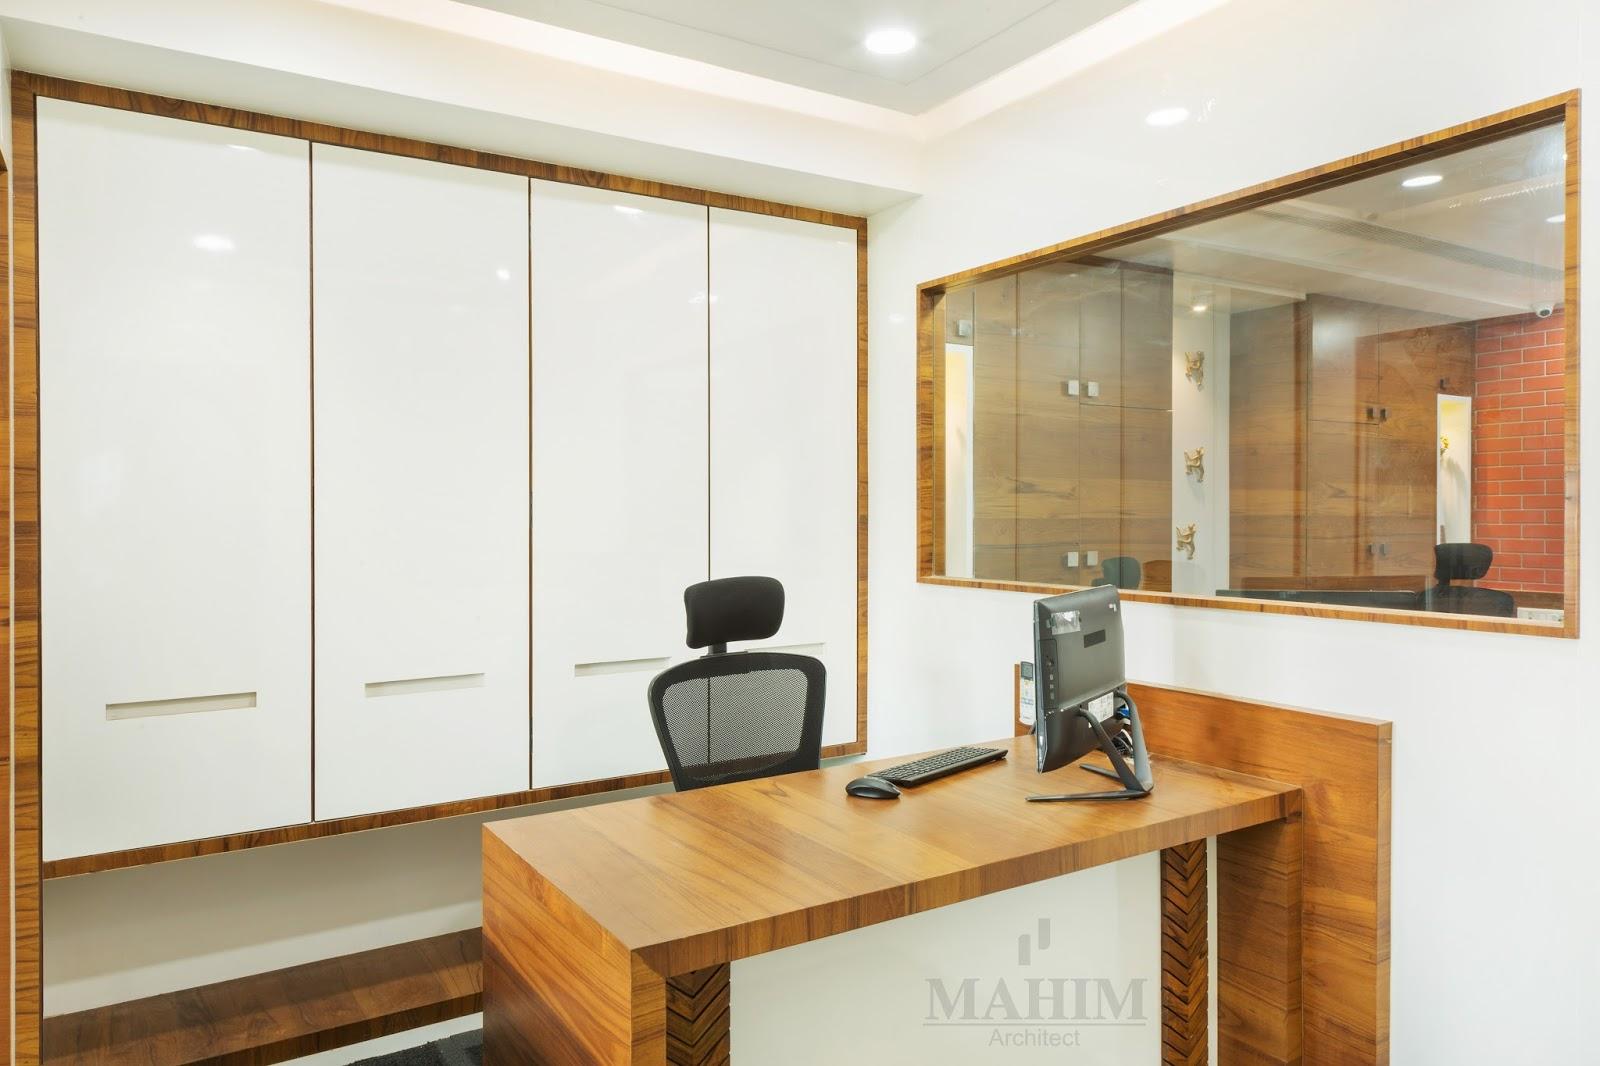 Mahim architect 2017 for Room design mahim